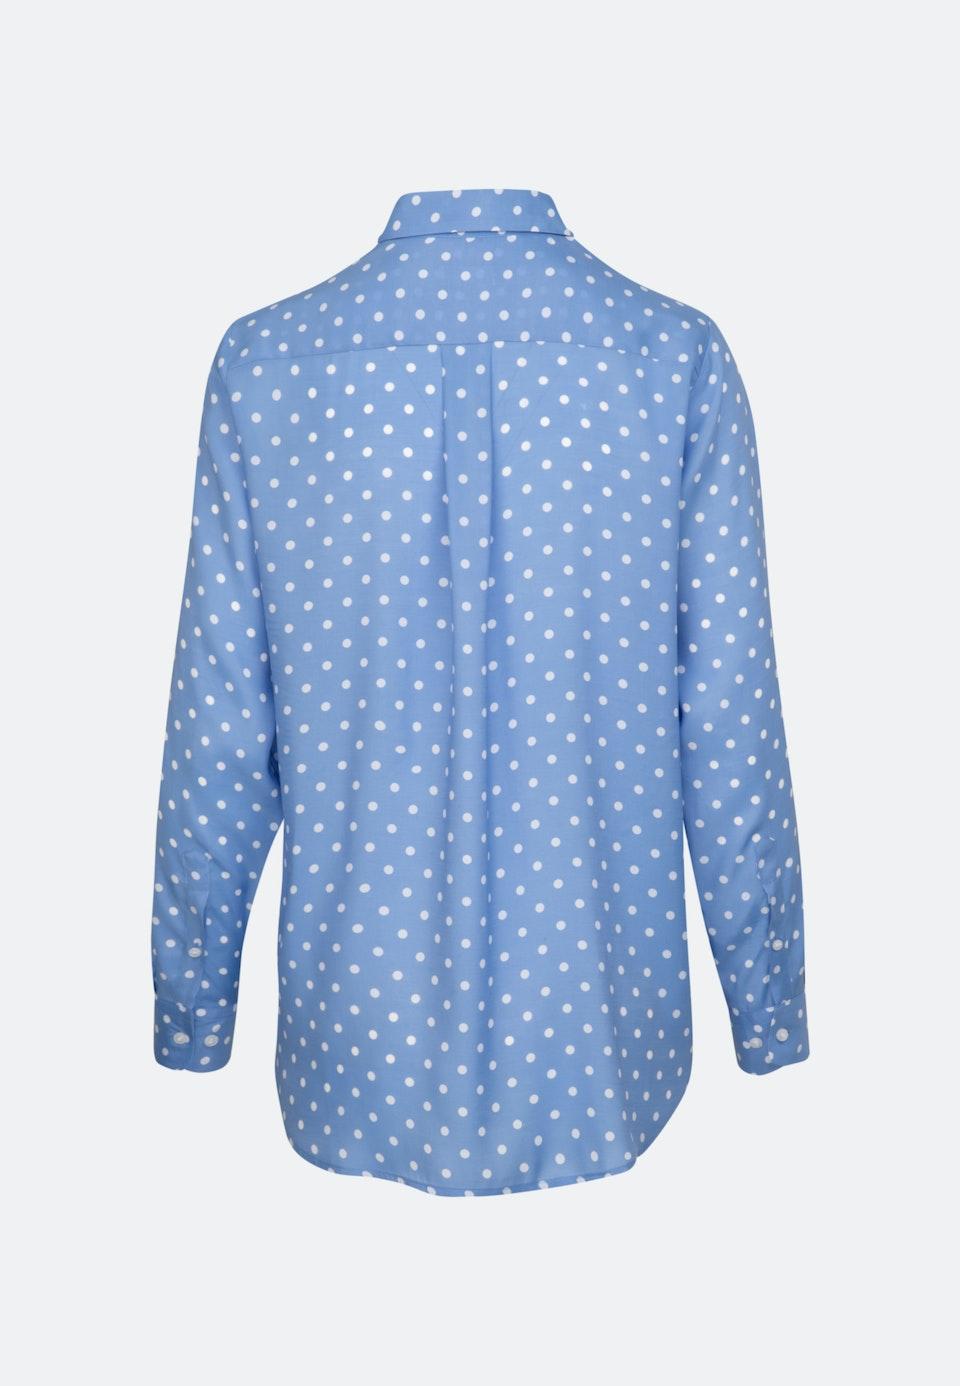 Voile Shirt Blouse made of 100% Viscose in Medium blue |  Seidensticker Onlineshop